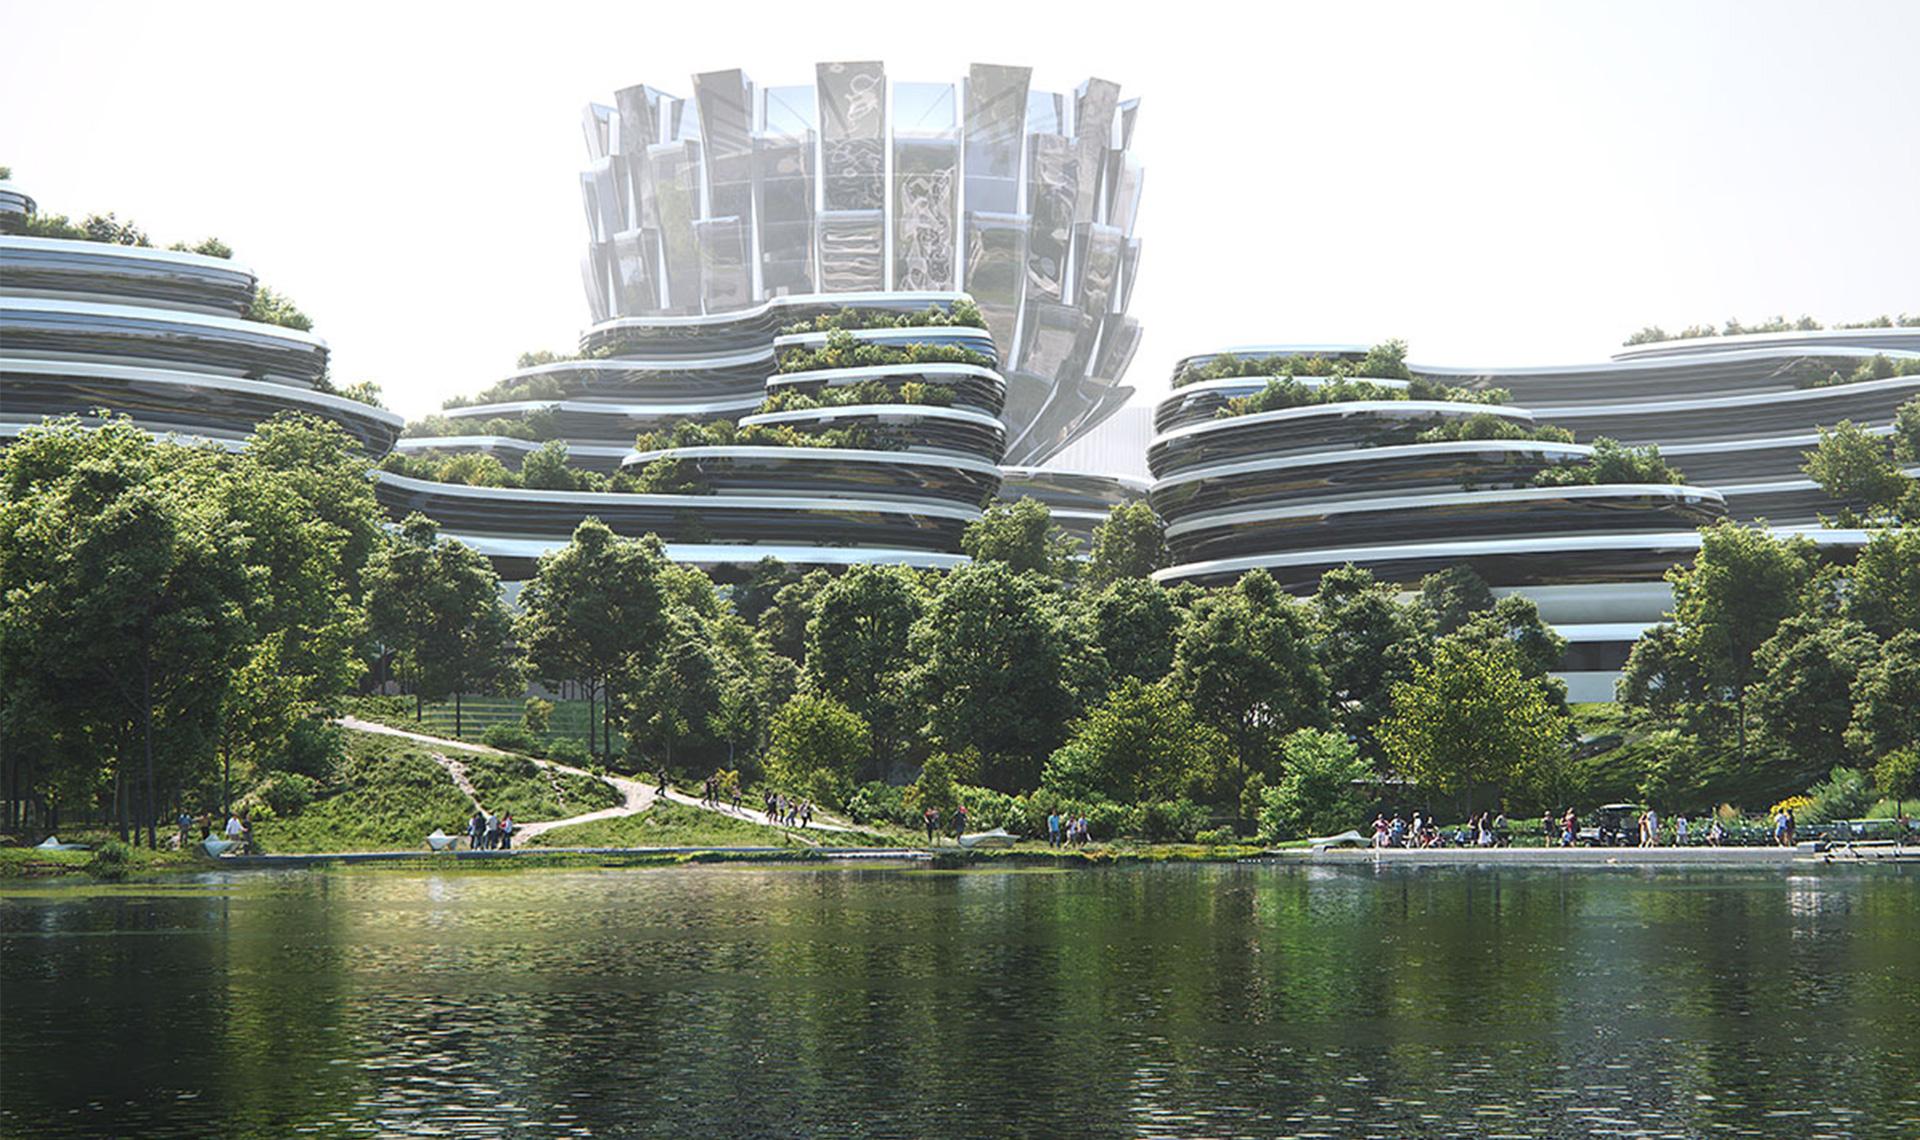 Zaha Hadid Architects cтроят остров для технологических стартапов в Китае